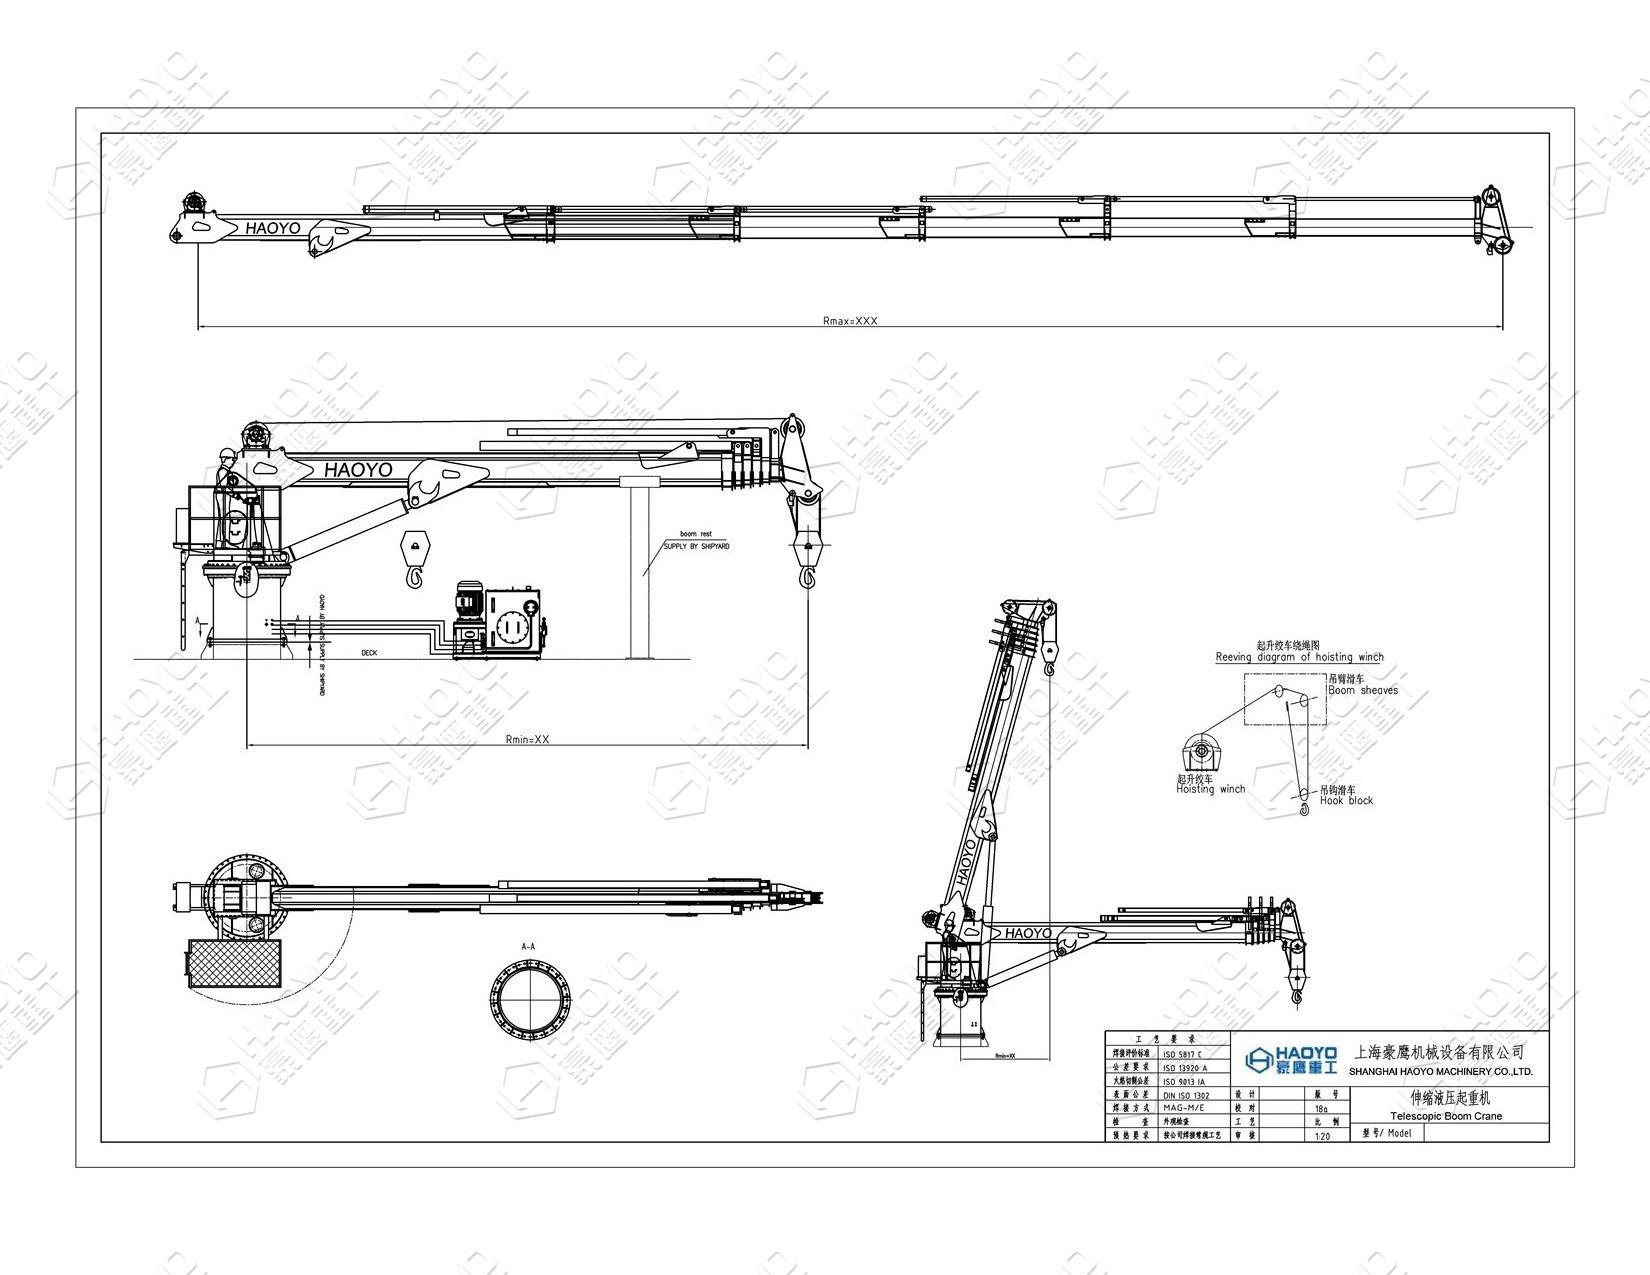 Telescoping Boom Working of Hydraulic Mobile Crane Capacity 4